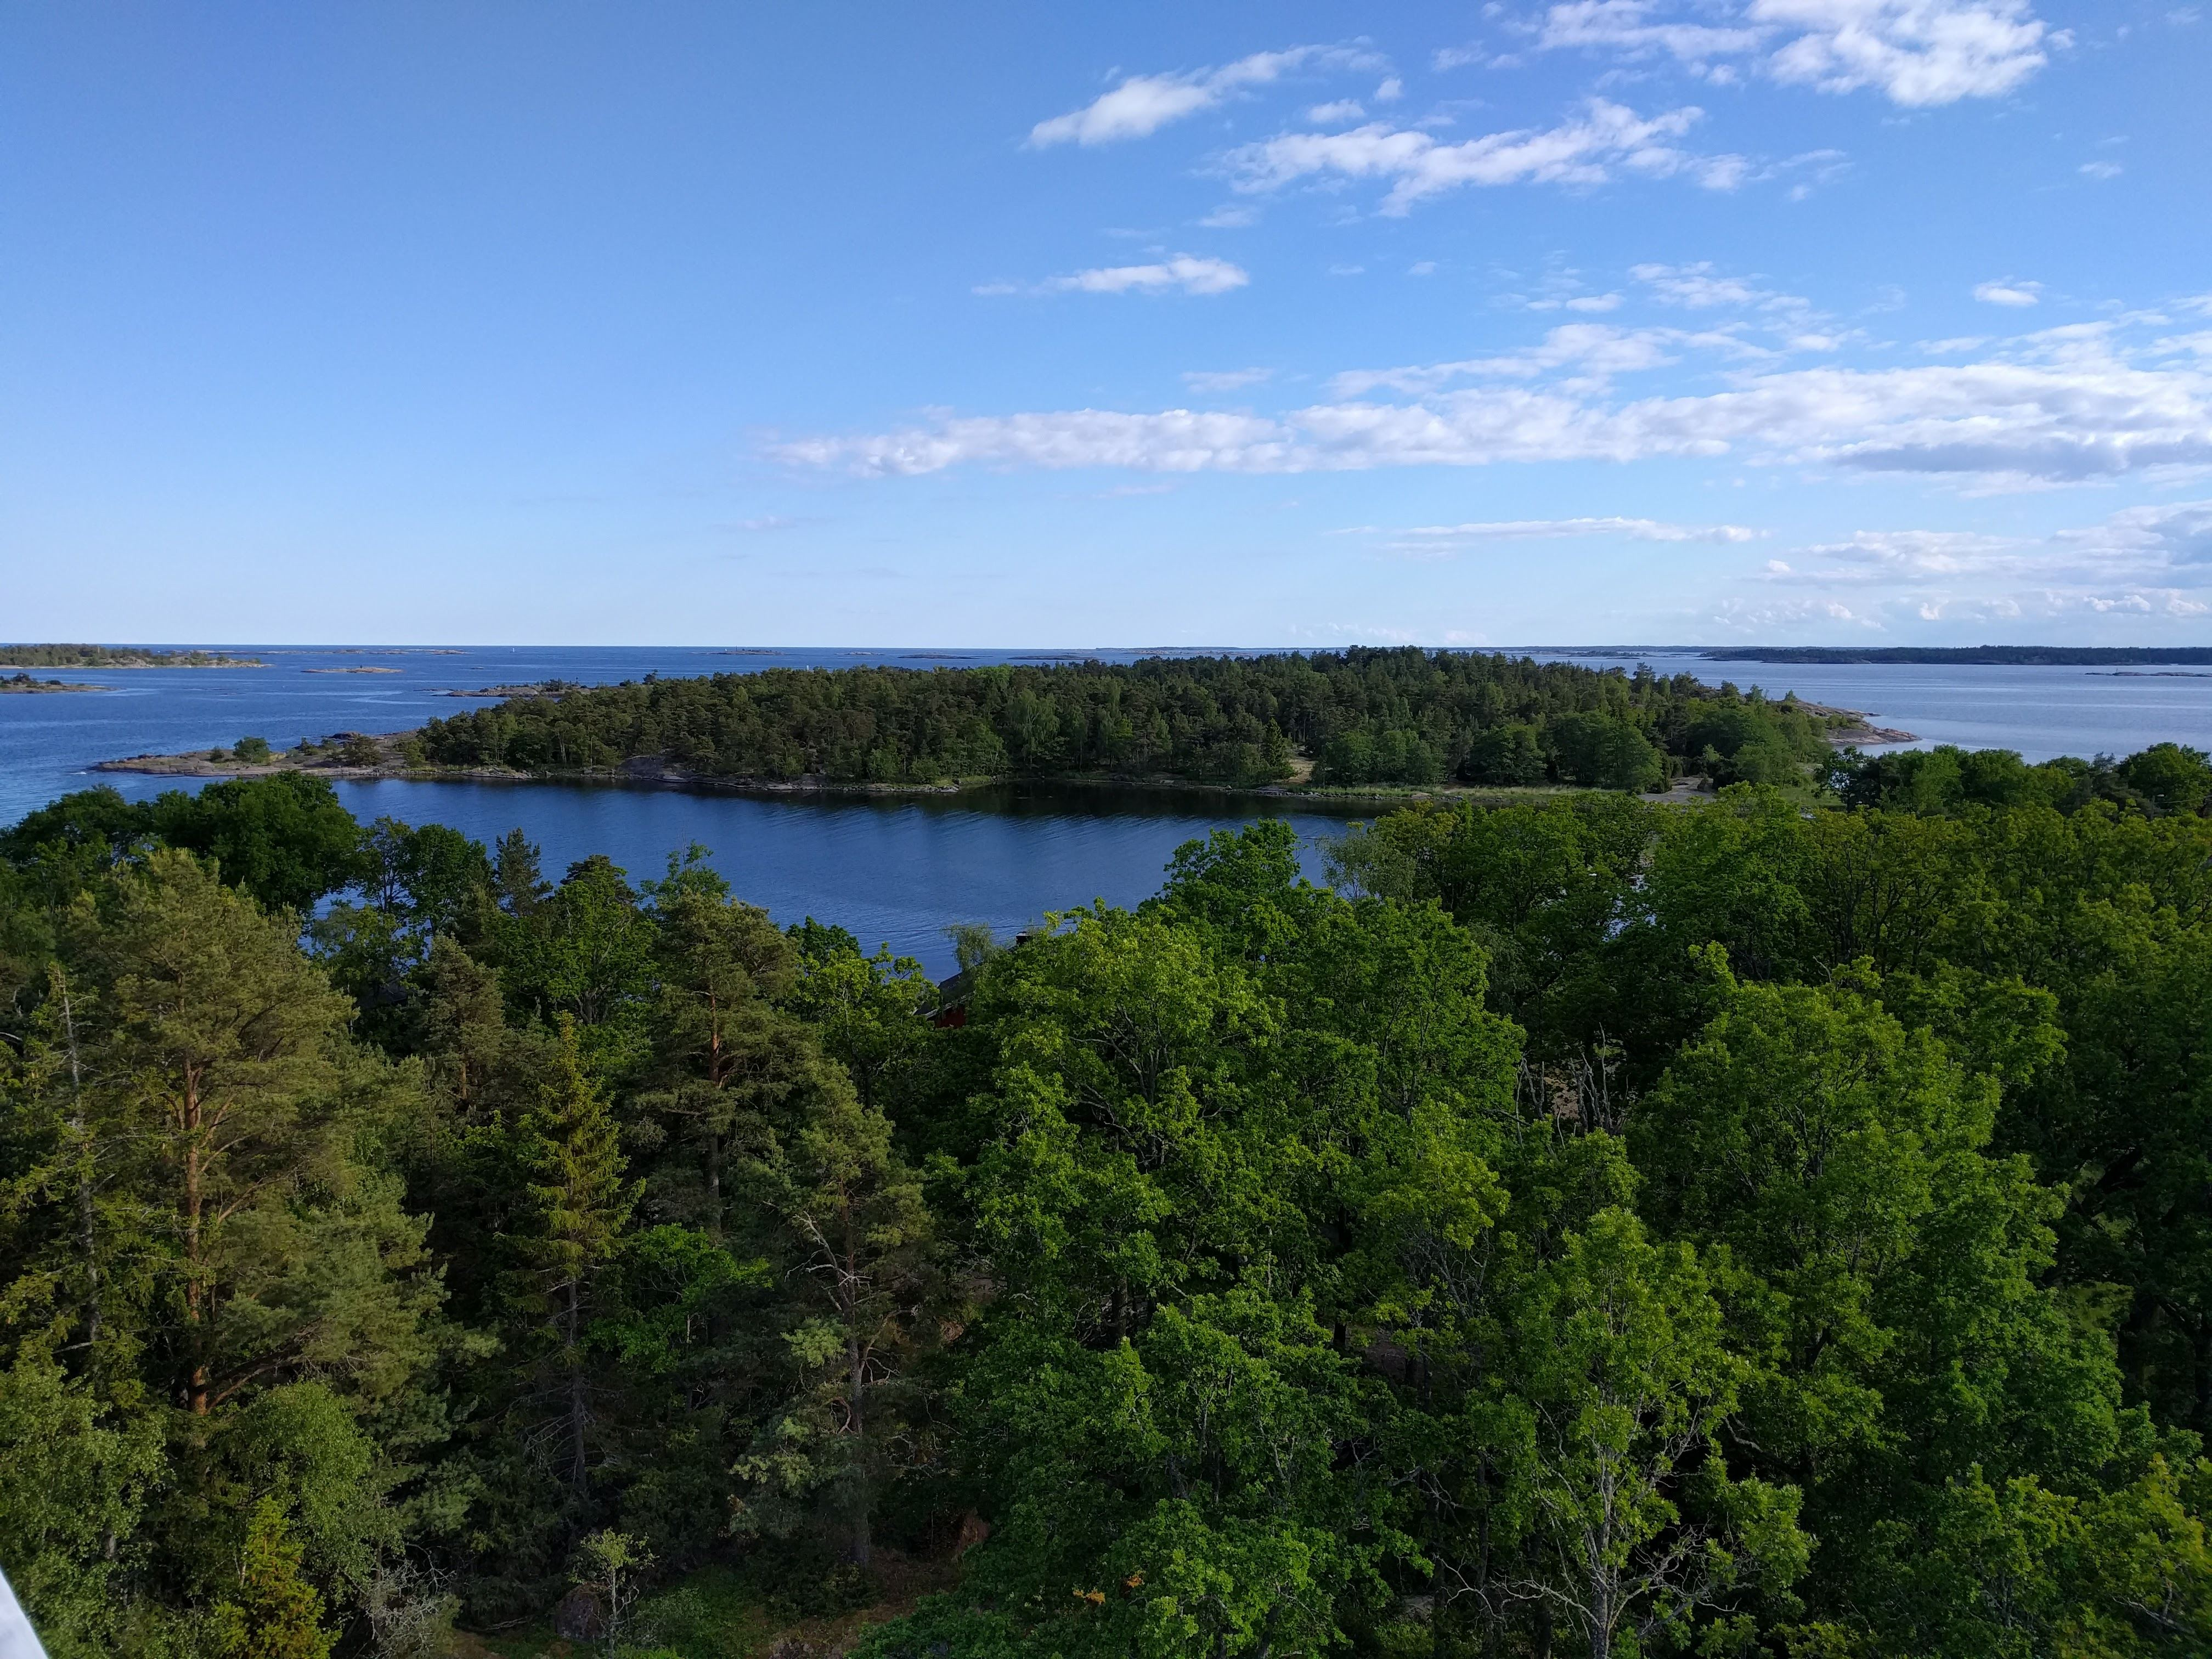 Lotsutkiken på Idö (Pilot outlook tower on Idö)